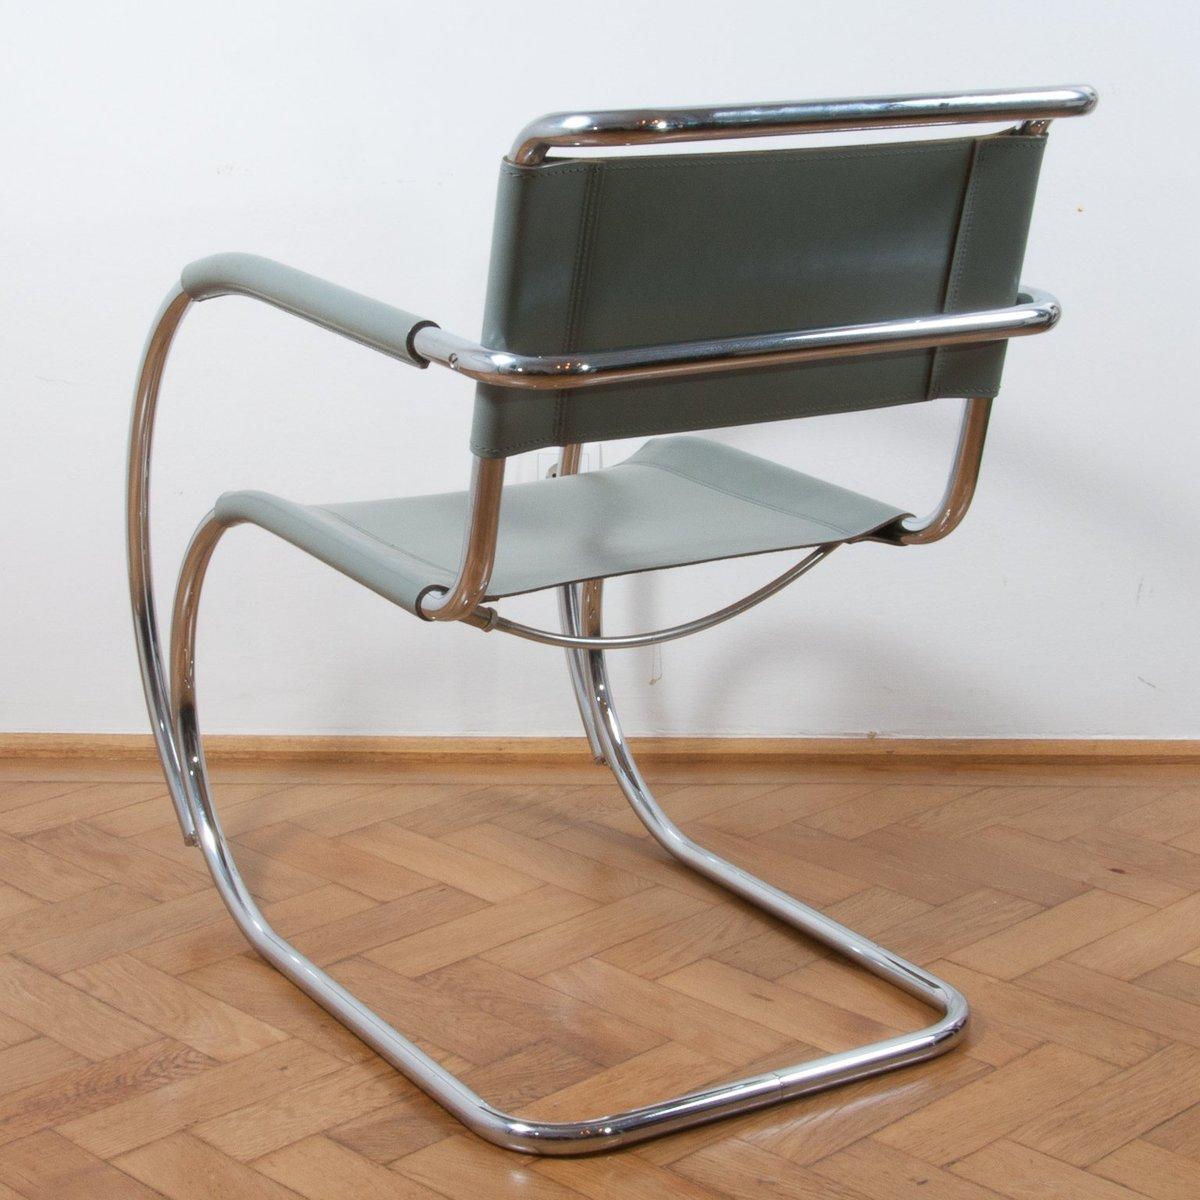 s533 cantilever stuhl von ludwig mies van der rohe f r thonet 1970er bei pamono kaufen. Black Bedroom Furniture Sets. Home Design Ideas